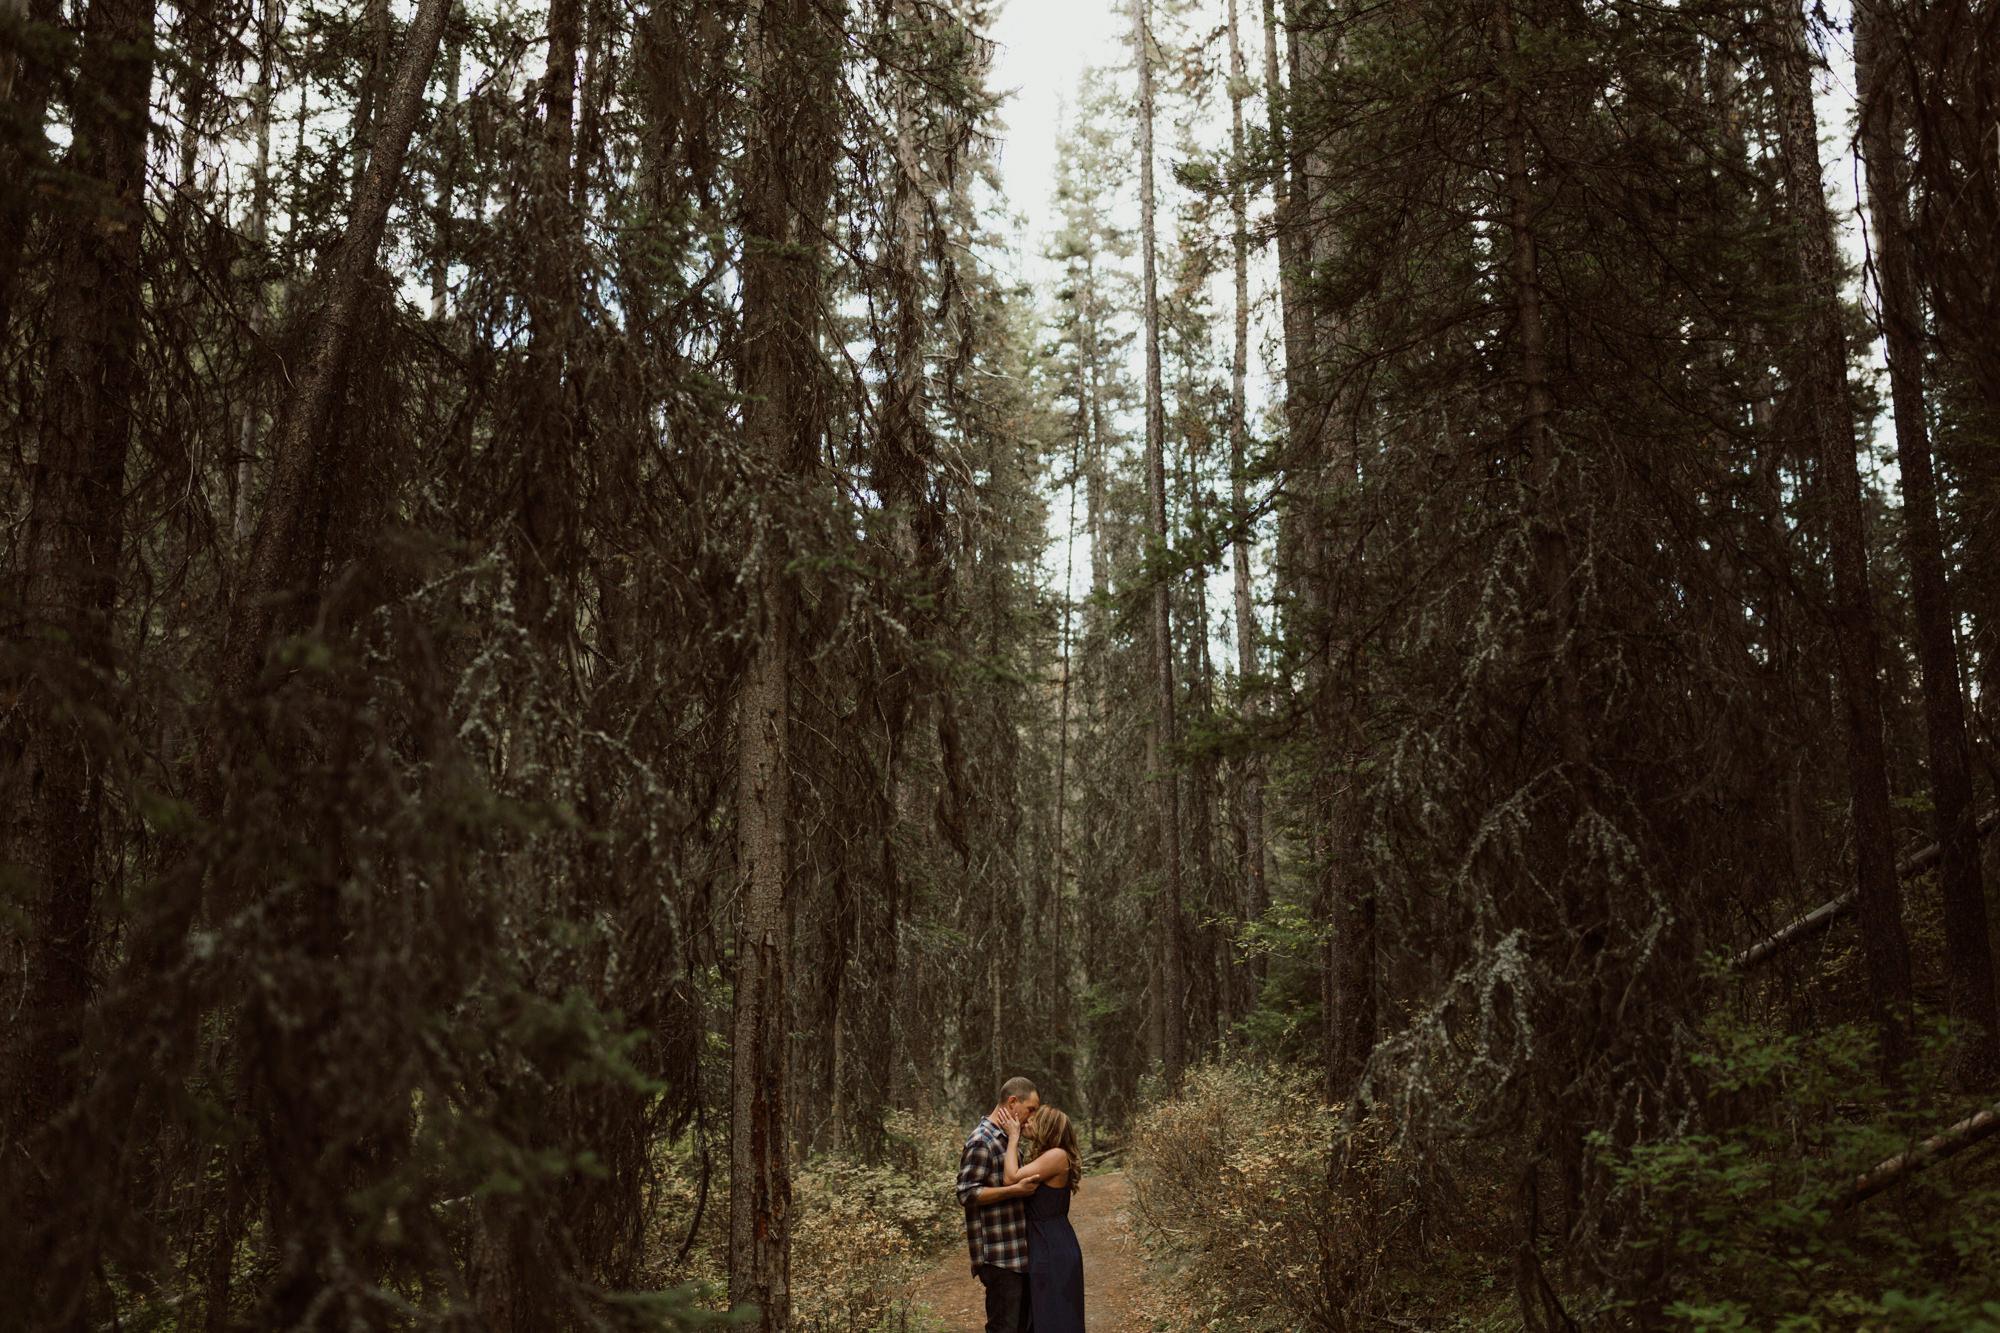 banff-engagements-destination-wedding-photographer-38.jpg